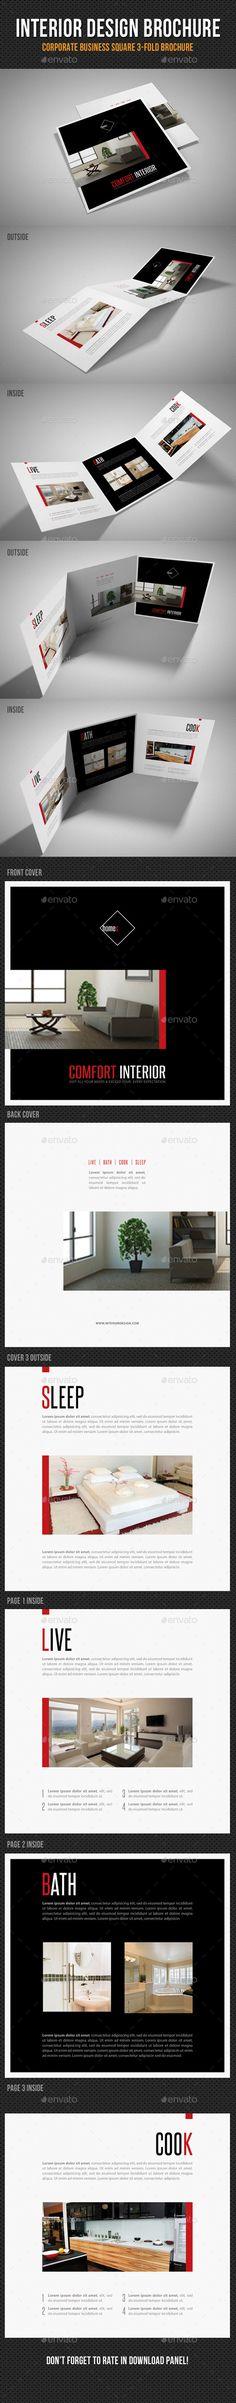 Interior Design Square 3-Fold Brochure. Download: http://graphicriver.net/item/interior-design-square-3fold-brochure-v04/11264969?ref=ksioks